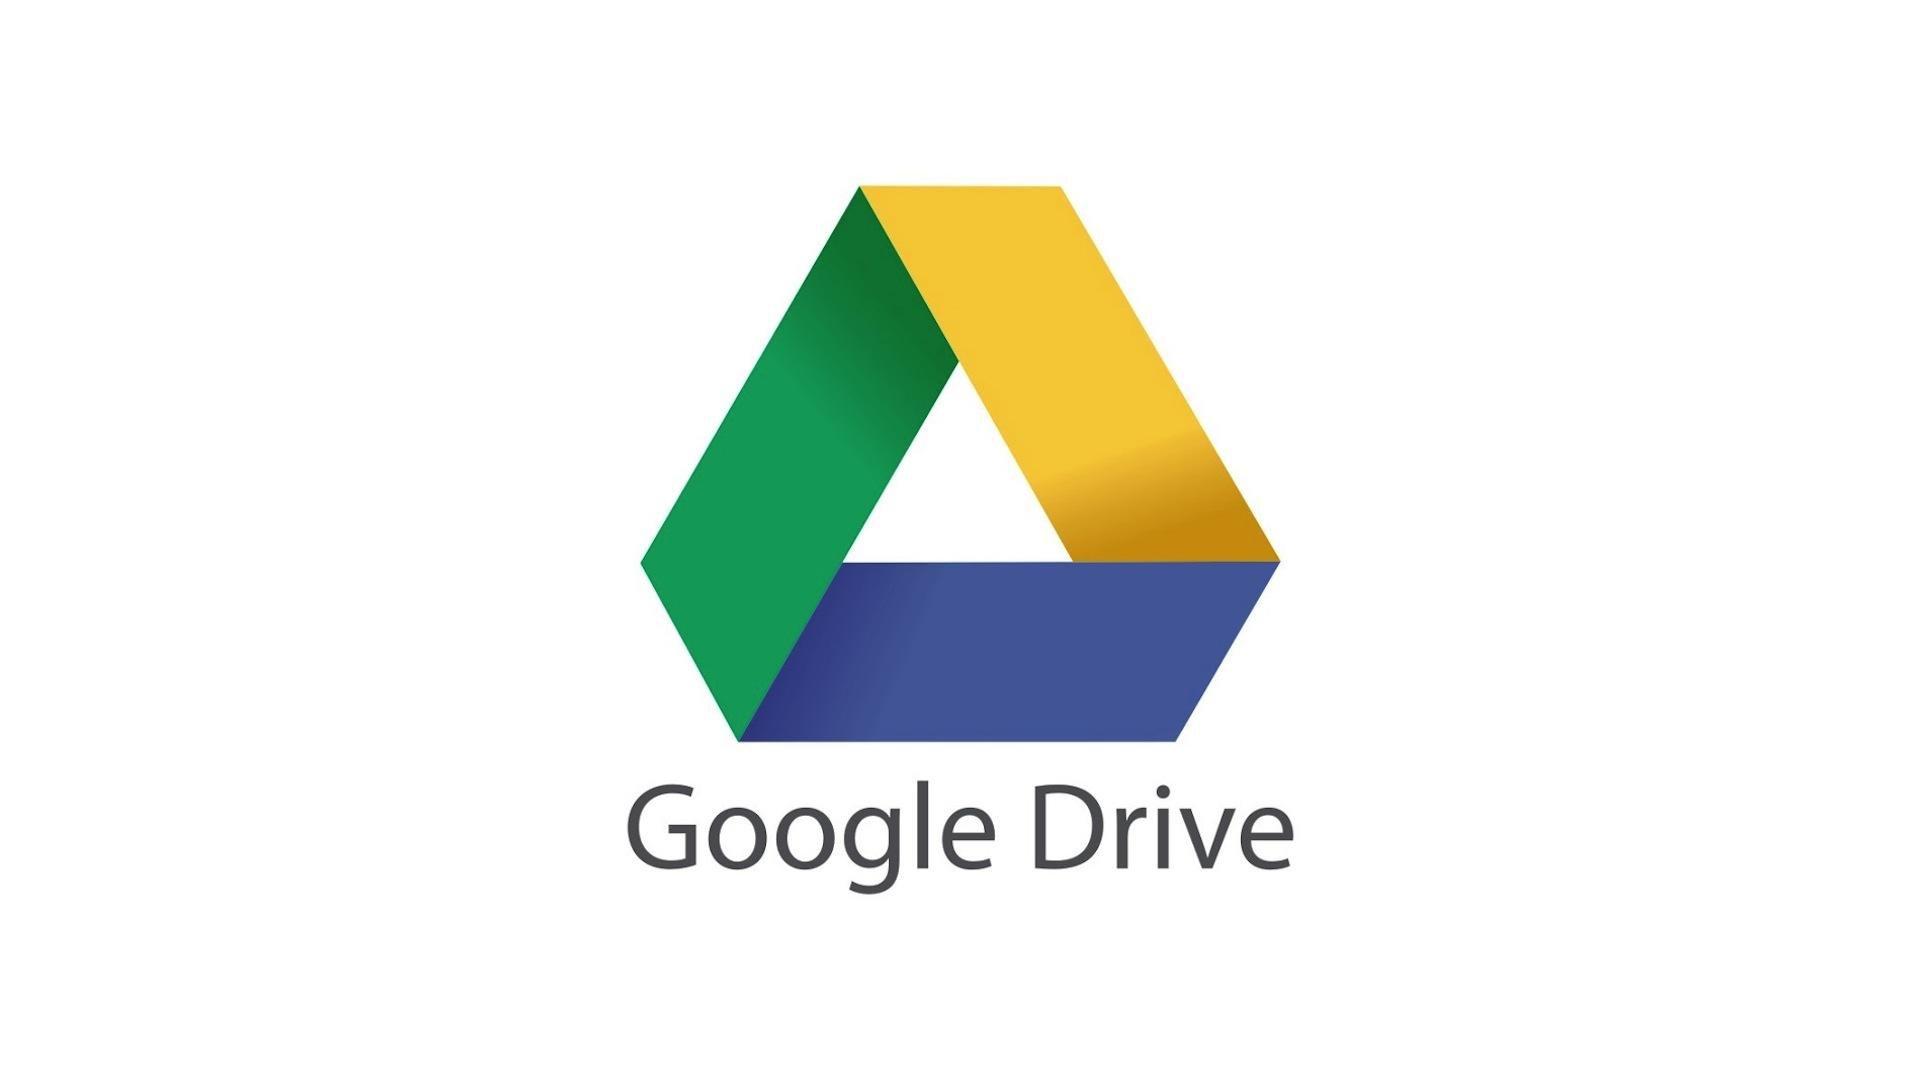 google stellt desktop app f r google drive ein. Black Bedroom Furniture Sets. Home Design Ideas